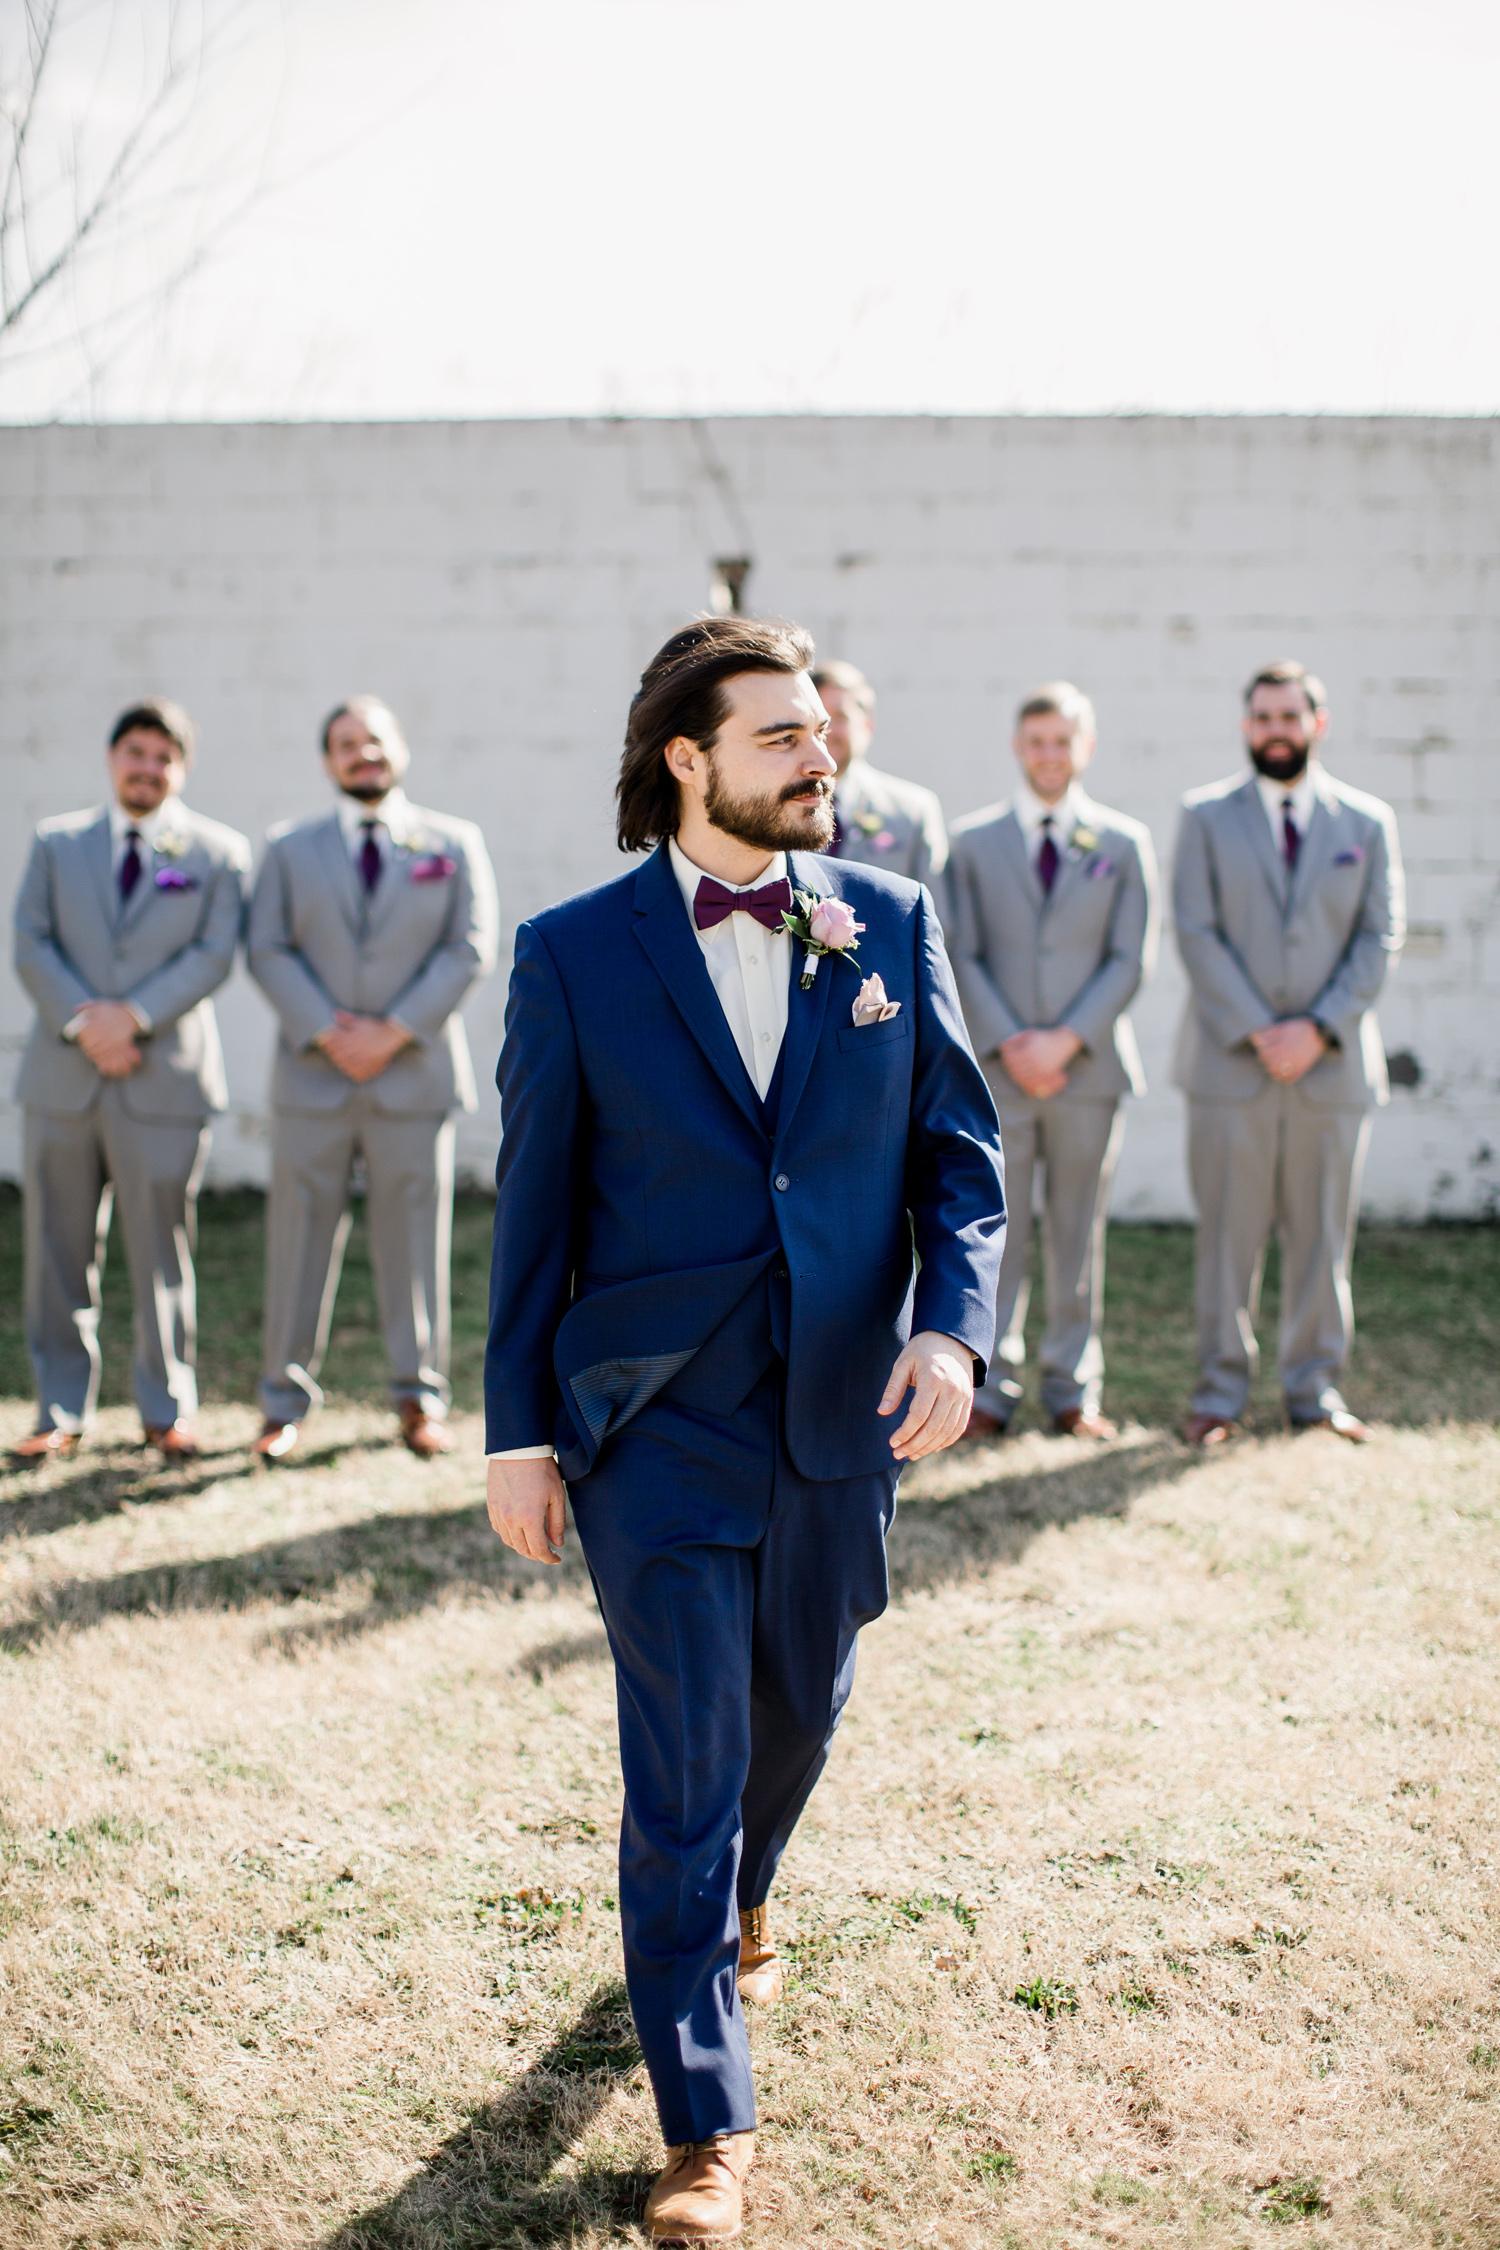 Downtown Knoxville Wedding Venue // Central Avenue Reception // Groom Portrait Outdoors